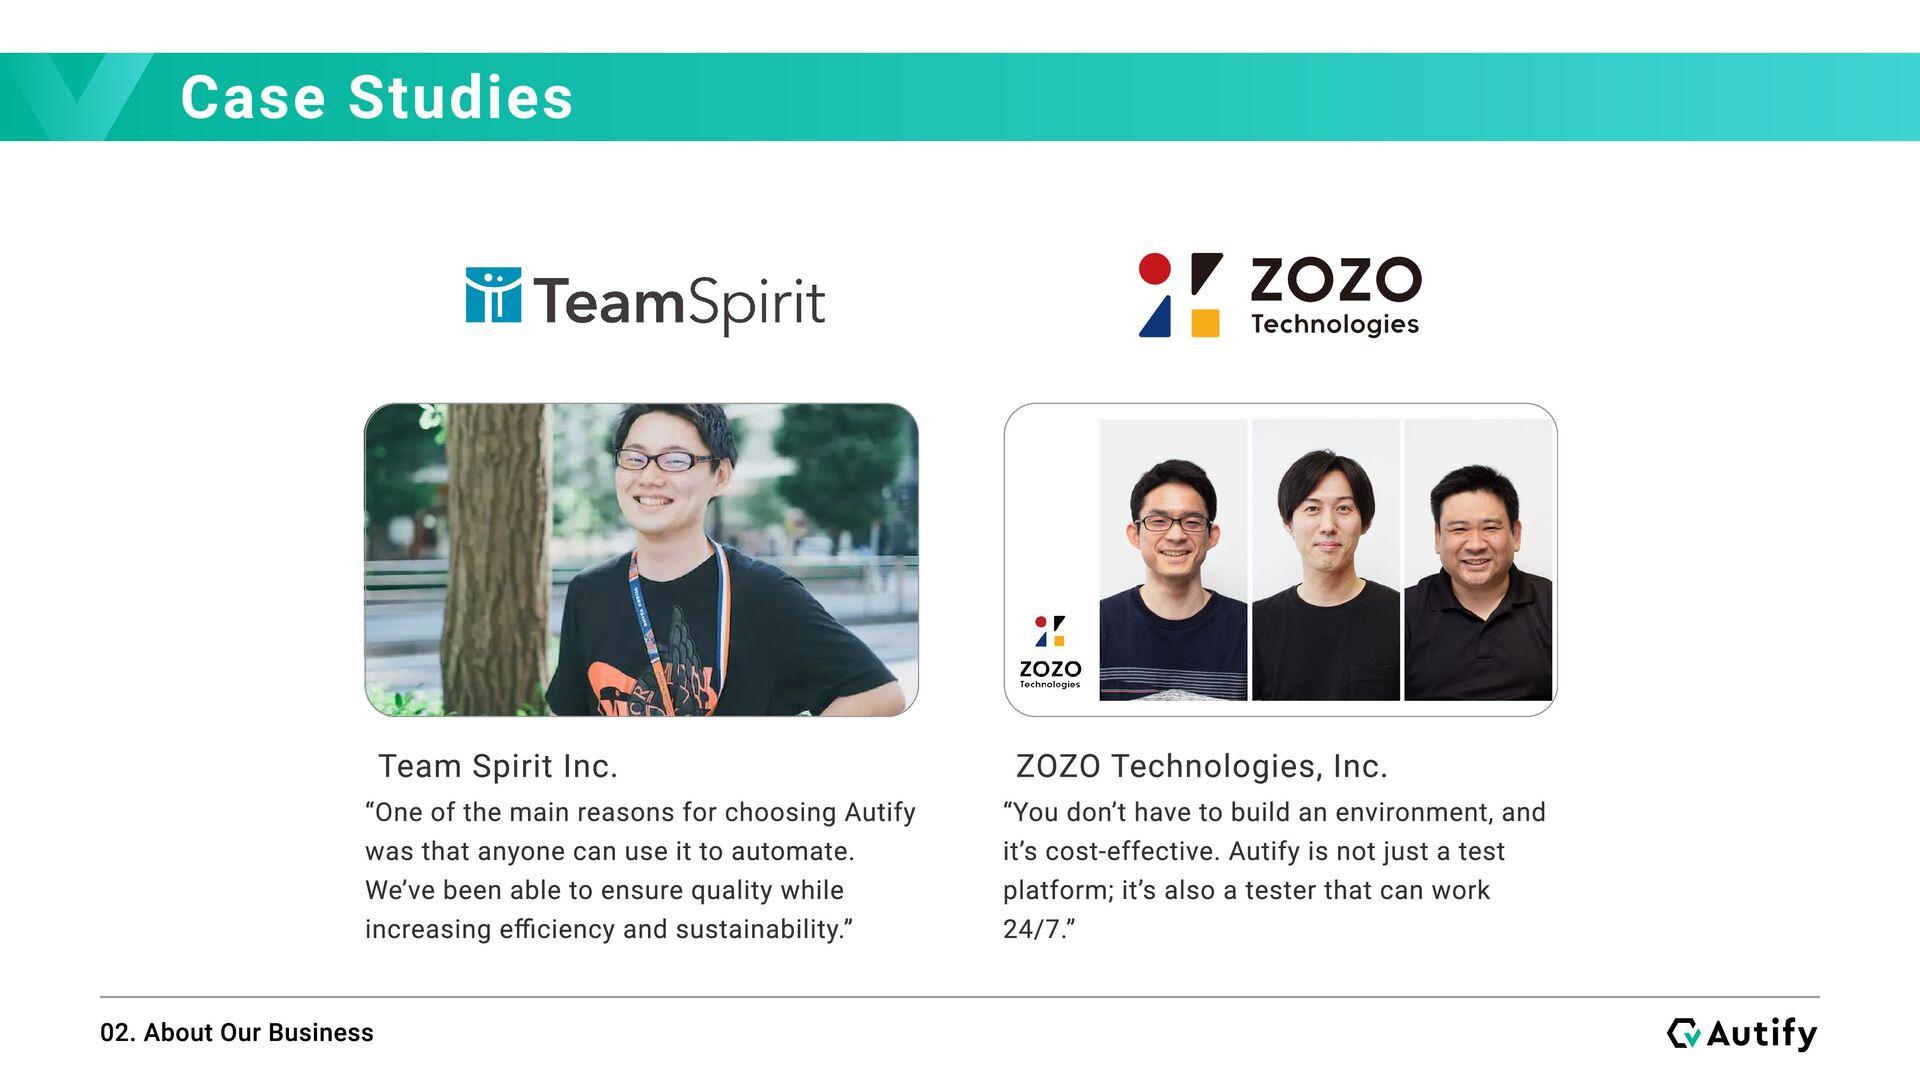 03. Our Team